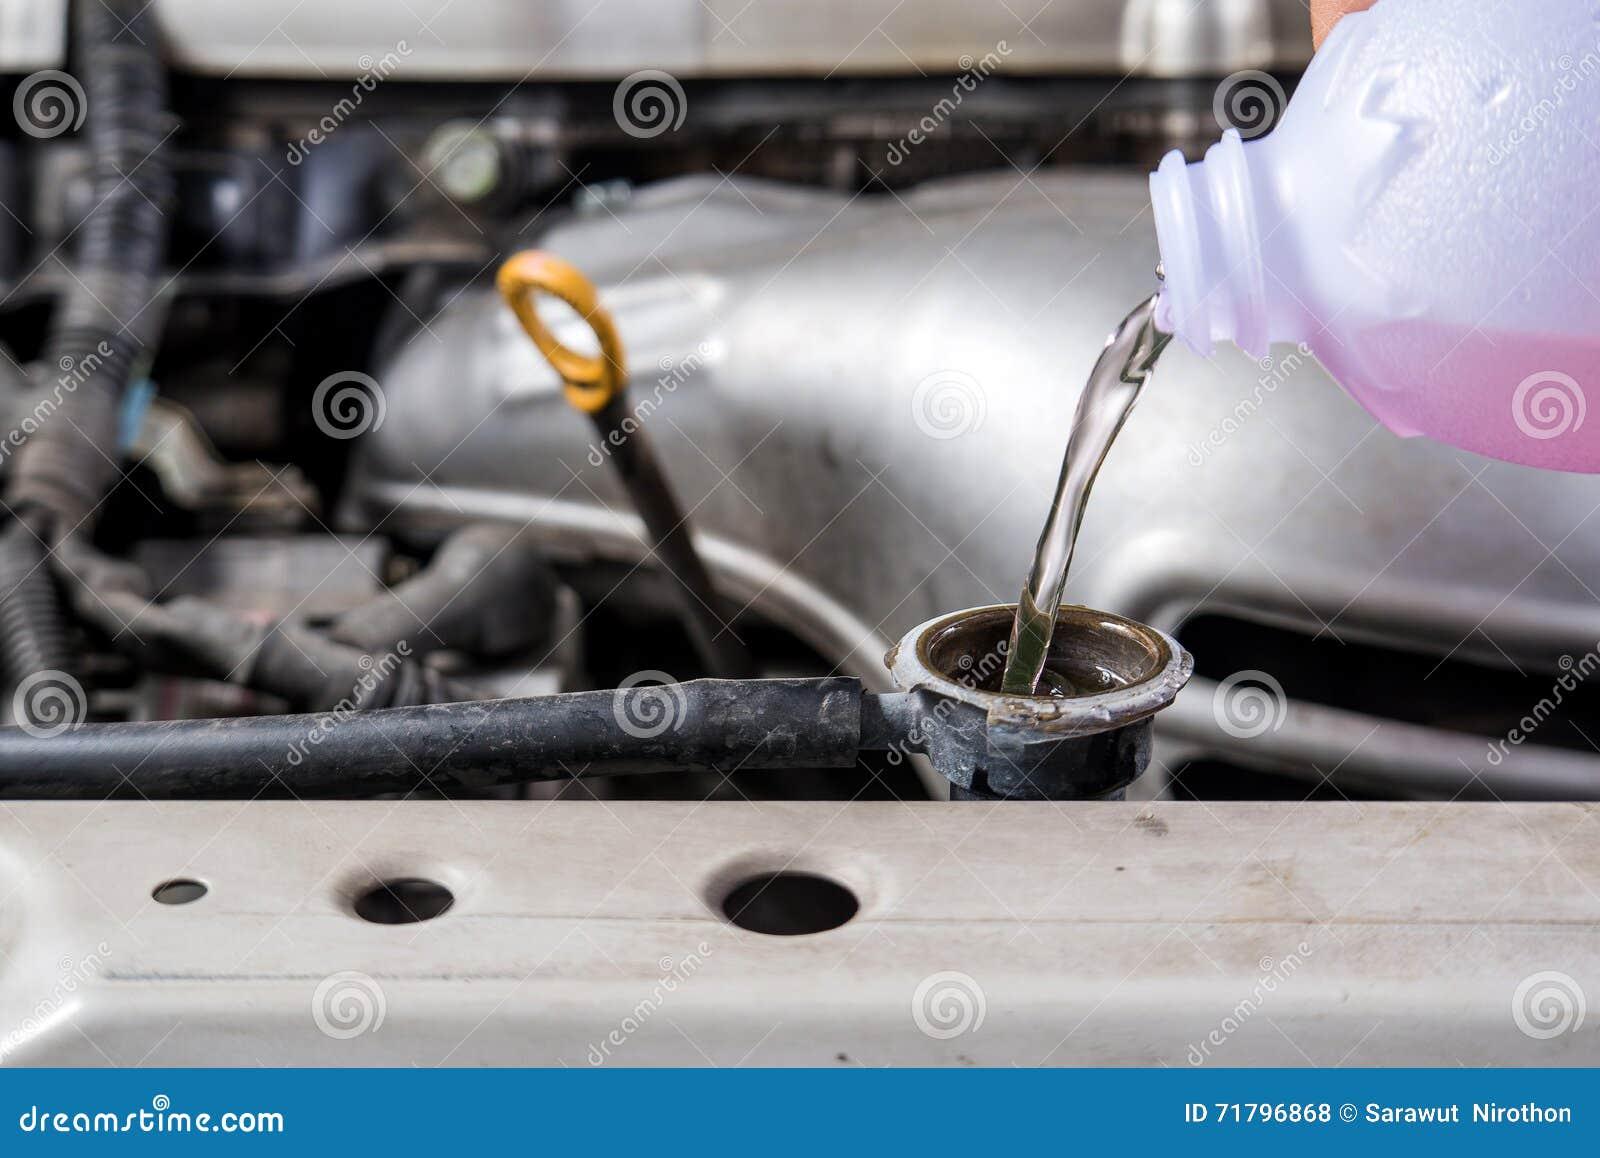 Add Water Car Radiator Check Water Car Radiator Stock Photo